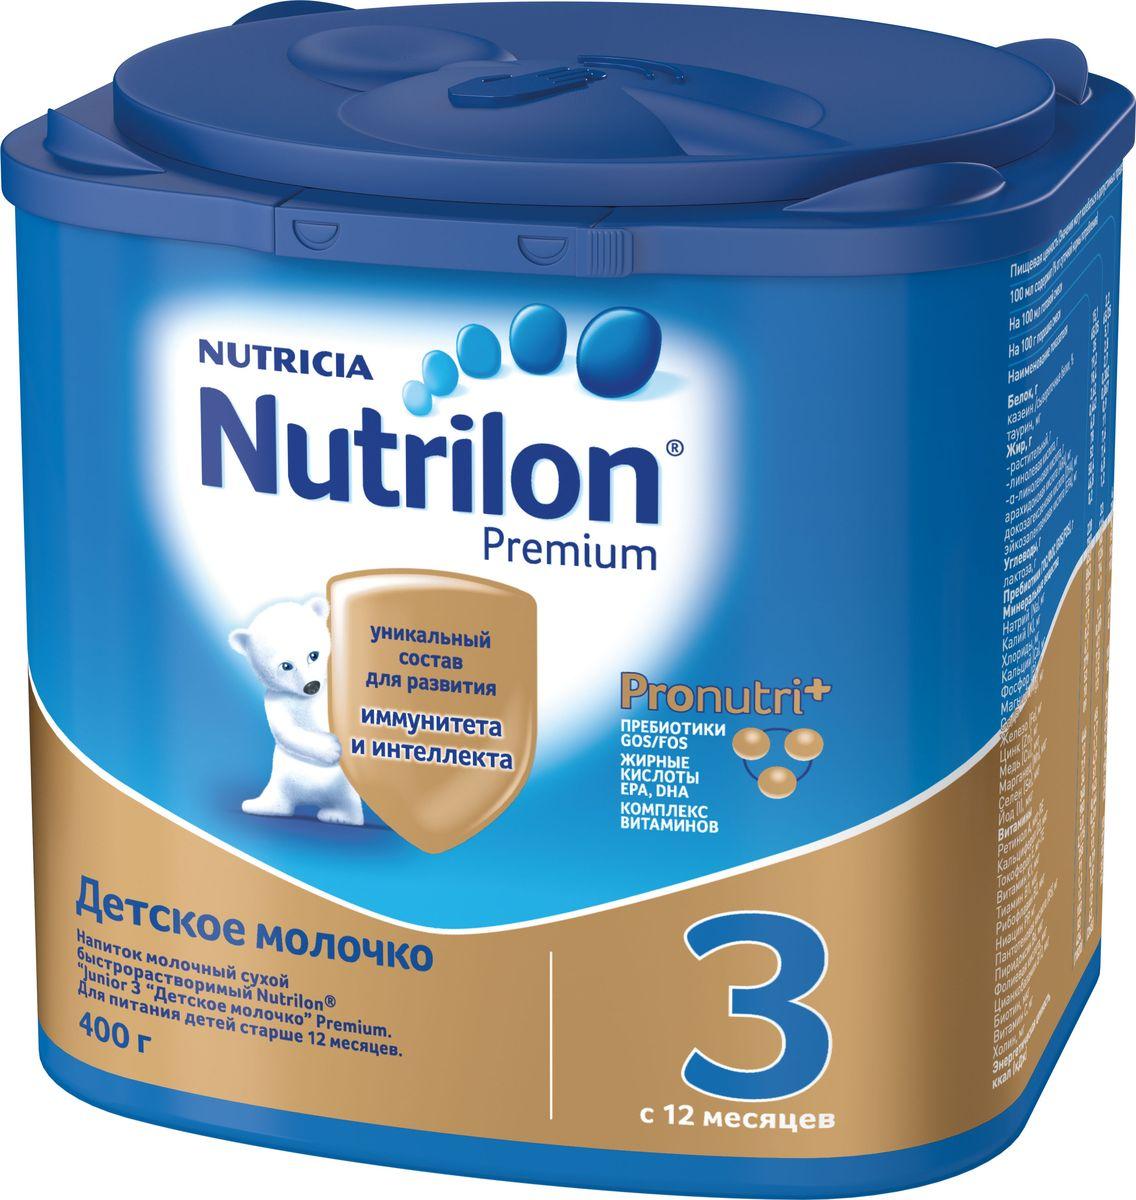 Nutrilon Джуниор Премиум 3 детское молочко PronutriPlus, с 12 месяцев, 400 г детское молочко малютка 4 700 г